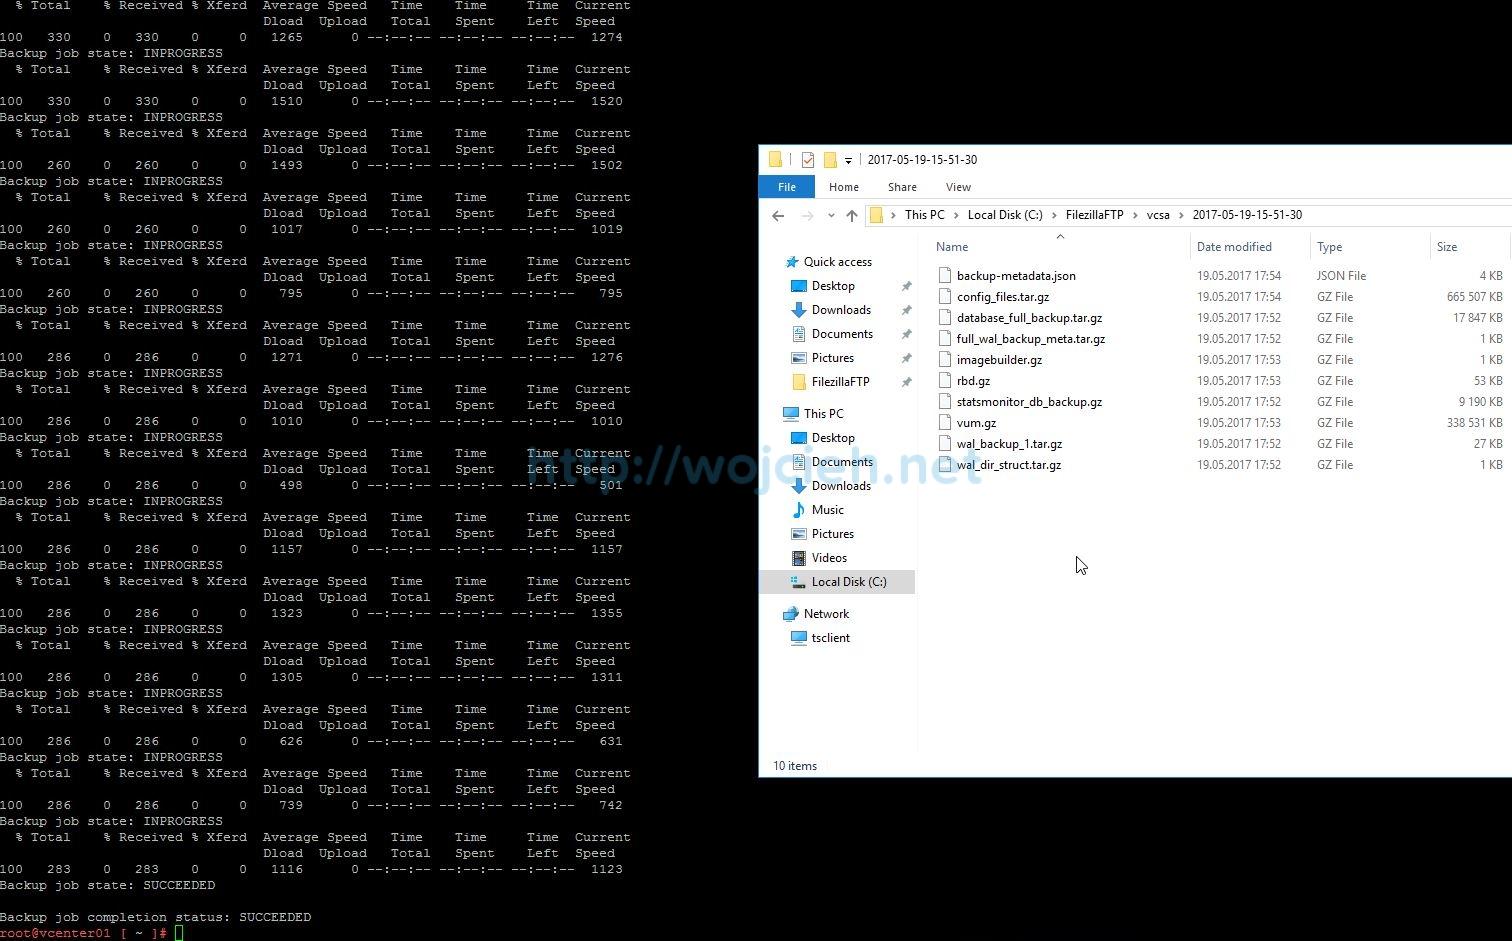 Update vCenter Server Appliance 6.5 to a newer version - 9